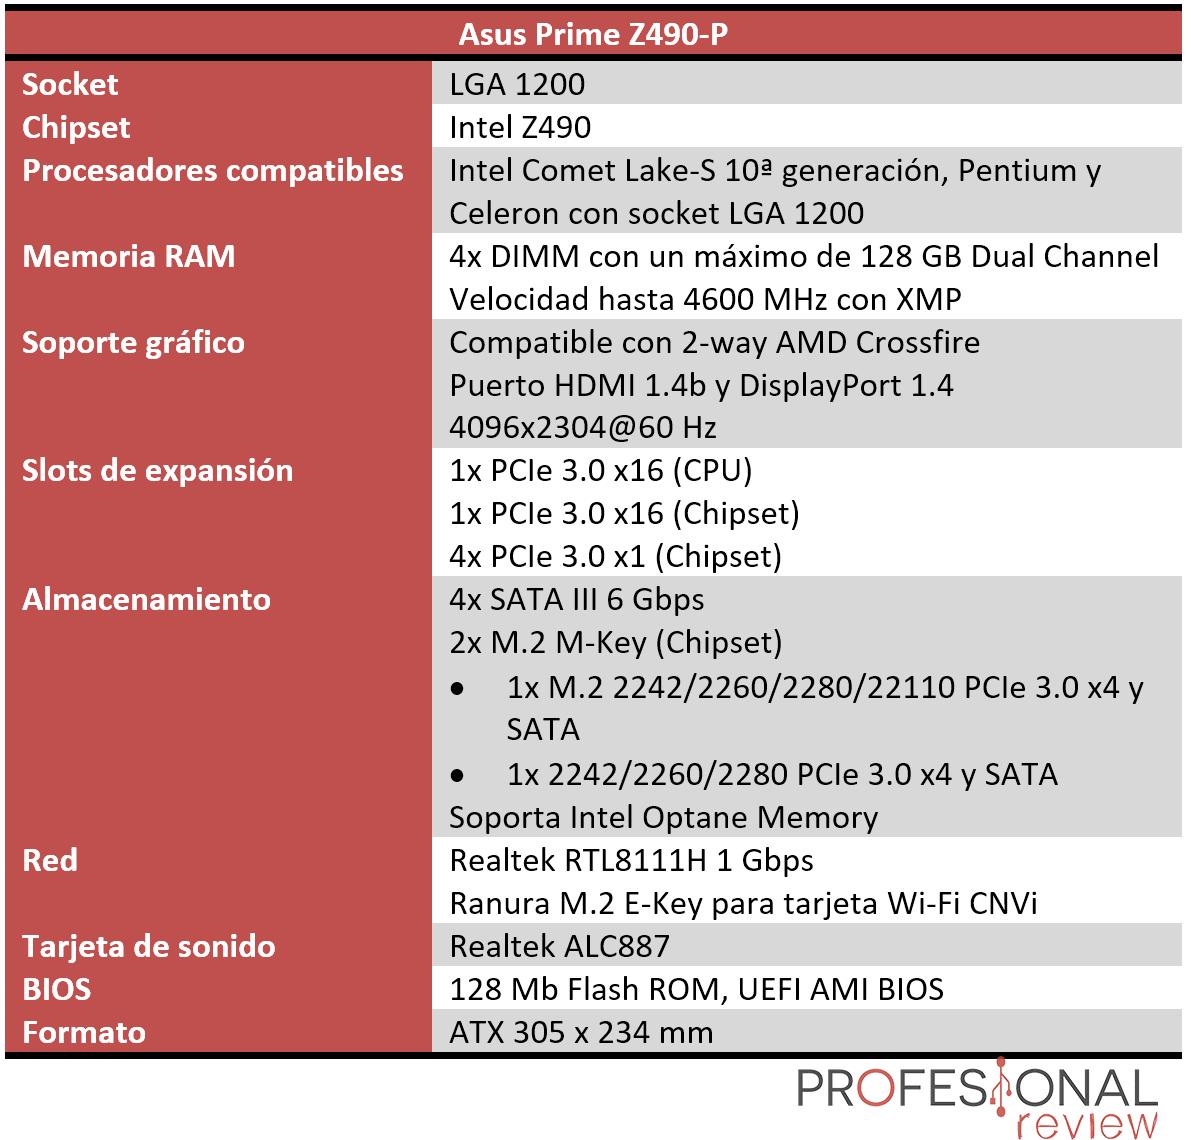 Asus Prime Z490-P Características